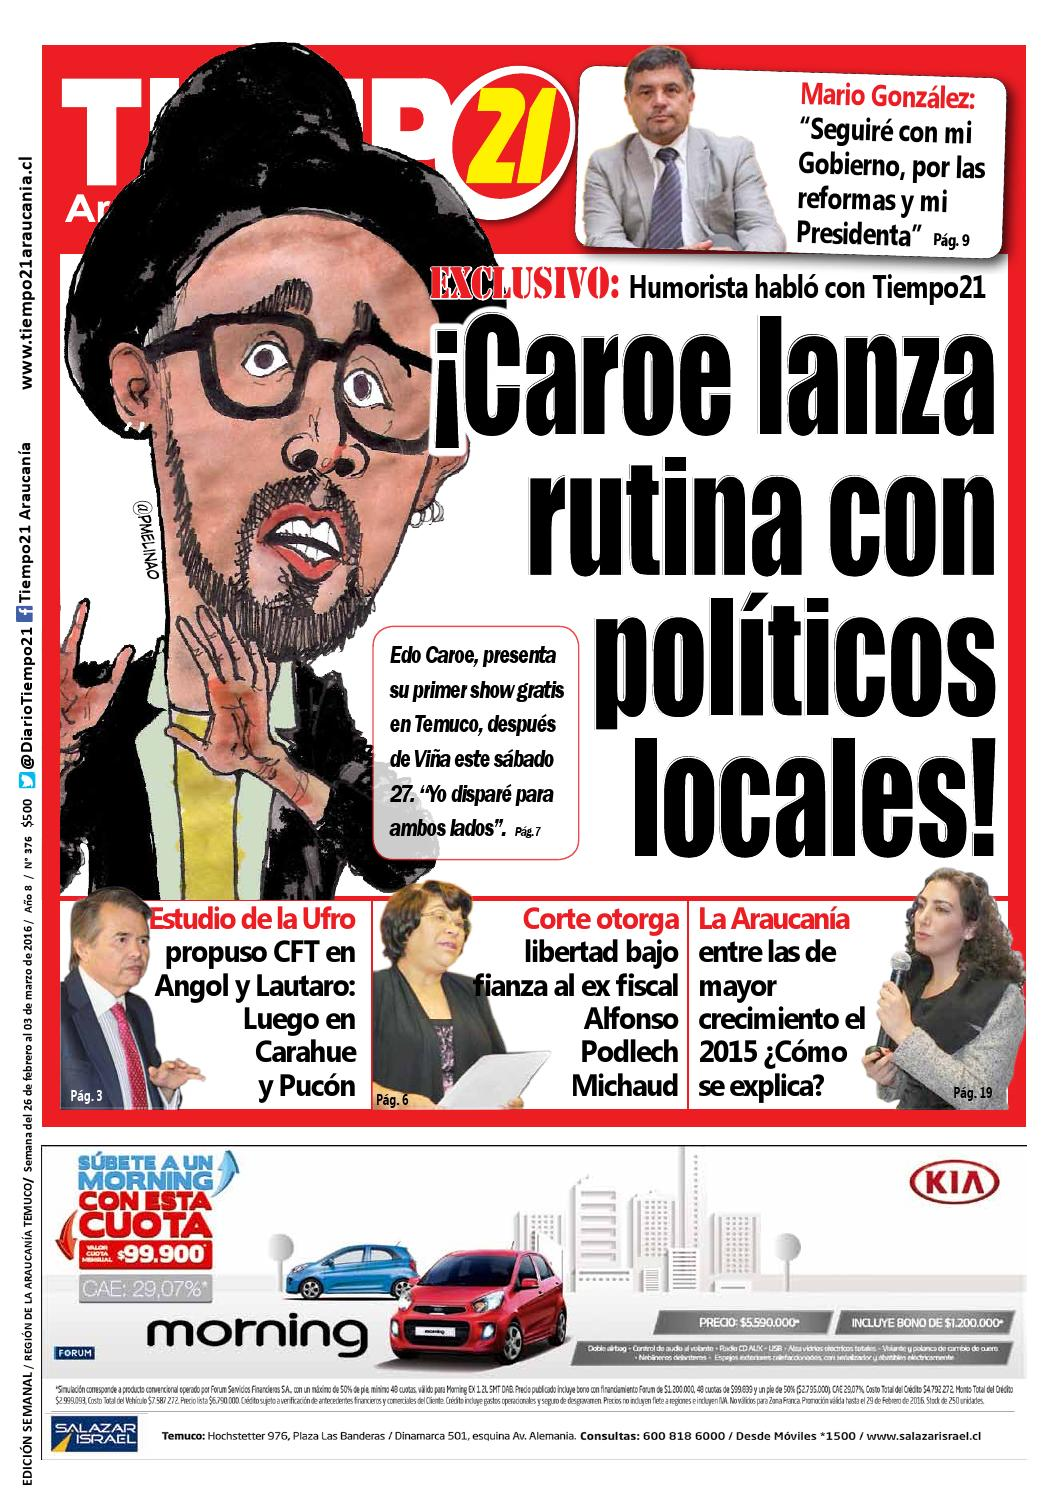 Edici N 376 Edo Caroe Lanza Rutina Con Pol Ticos Locales By  # Muebles Jouannet Temuco